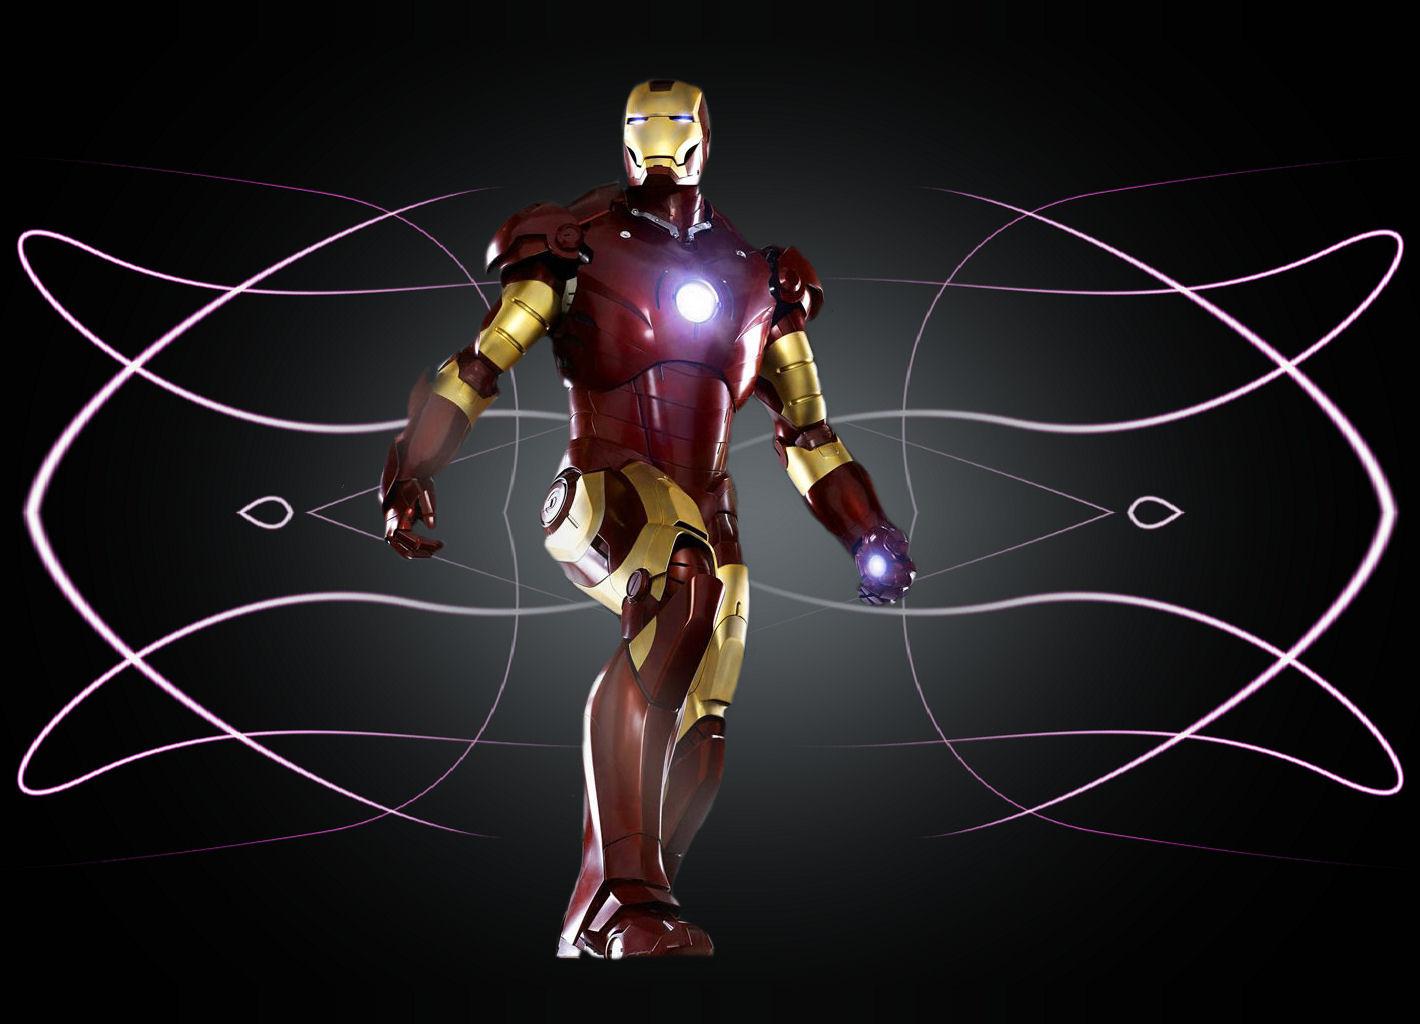 Iron man wallpaper and background image 1420x1024 id 71446 for Sfondi iron man